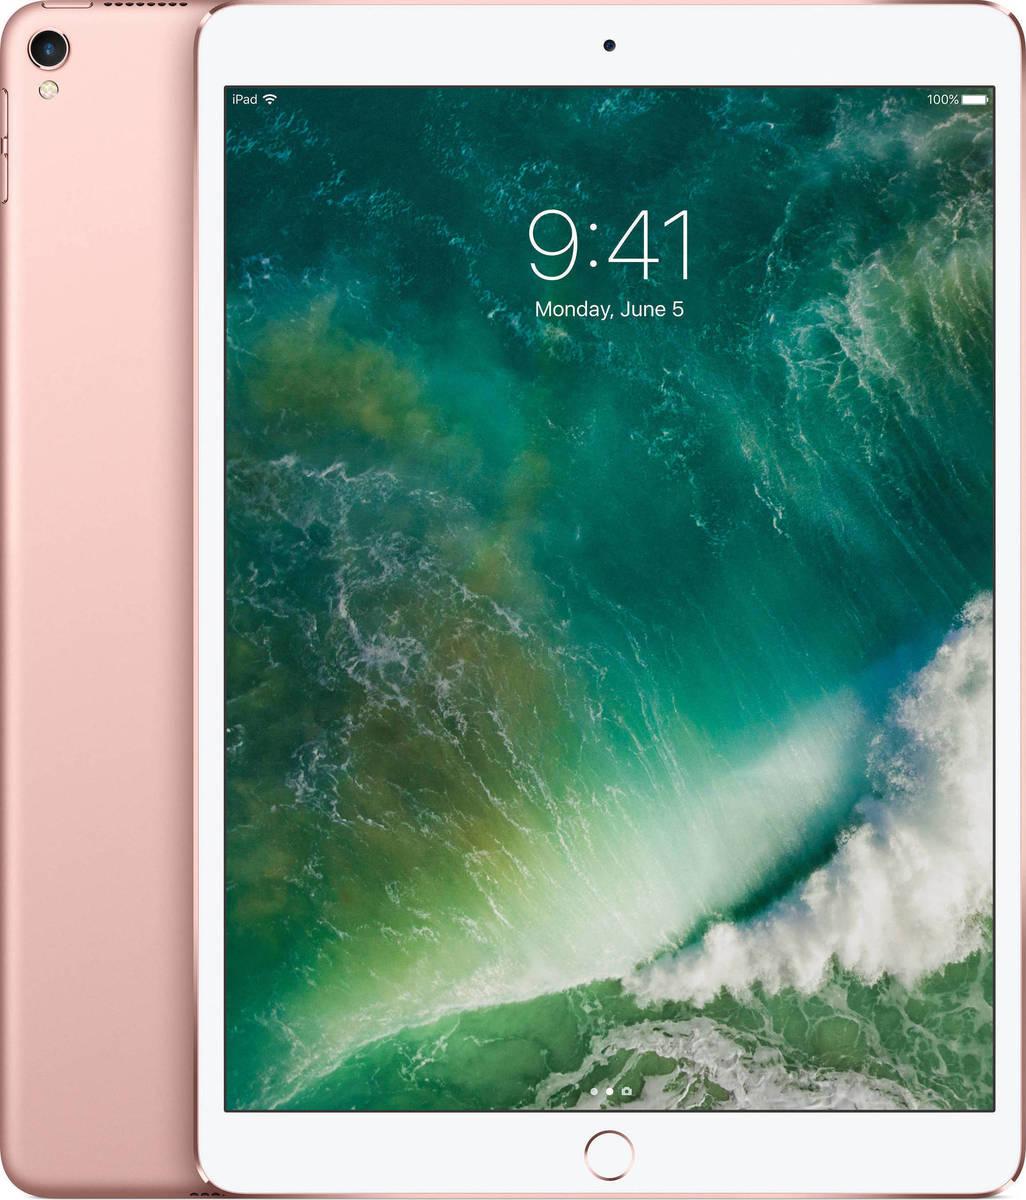 Apple iPad Pro 10.5'' 2017 WiFi 64GB Rose Gold Με Αντάπτορα Πληρωμή έως 24 δόσεις